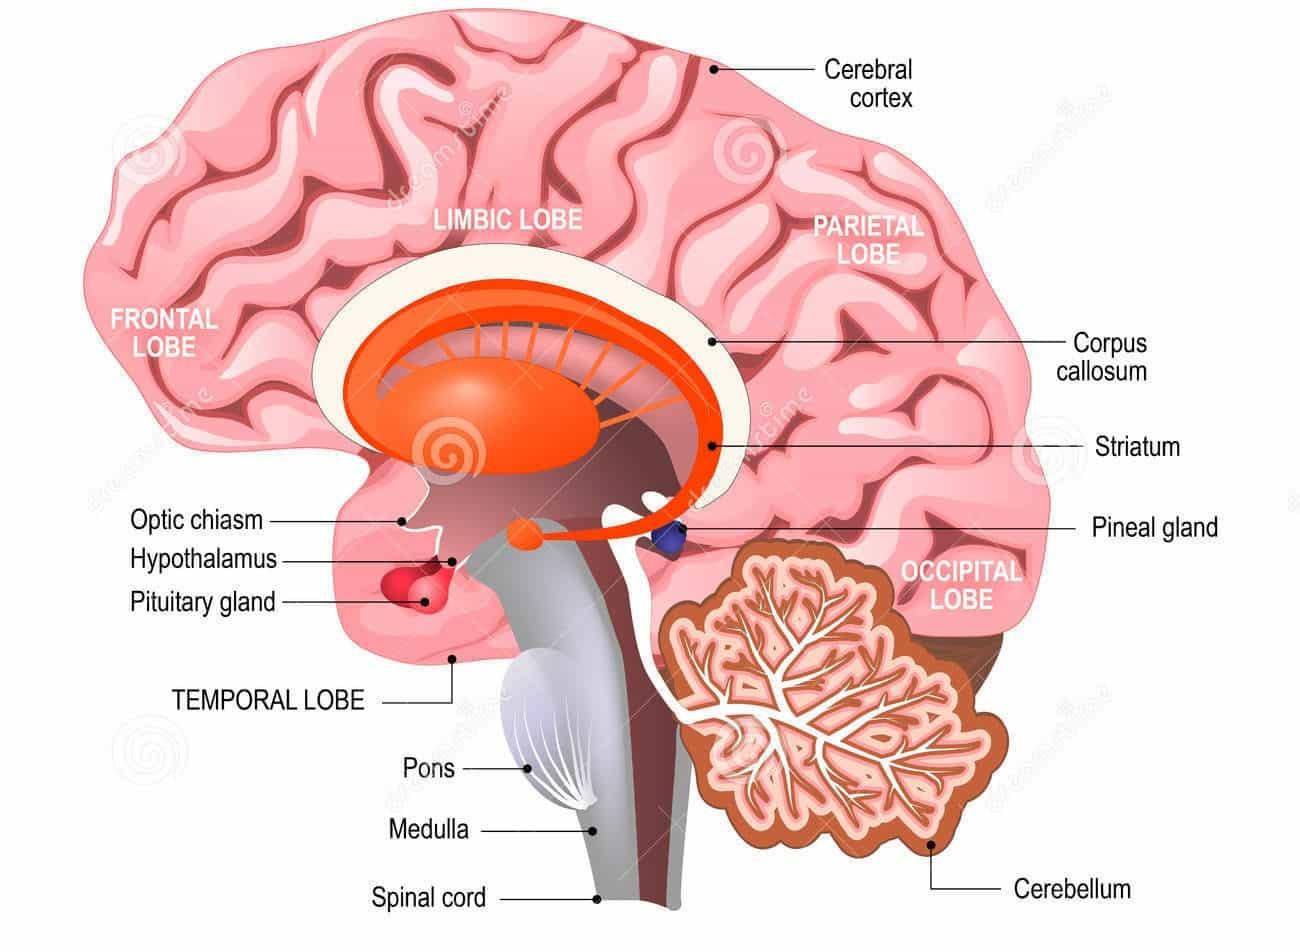 Creative Power of The Brain - the brain